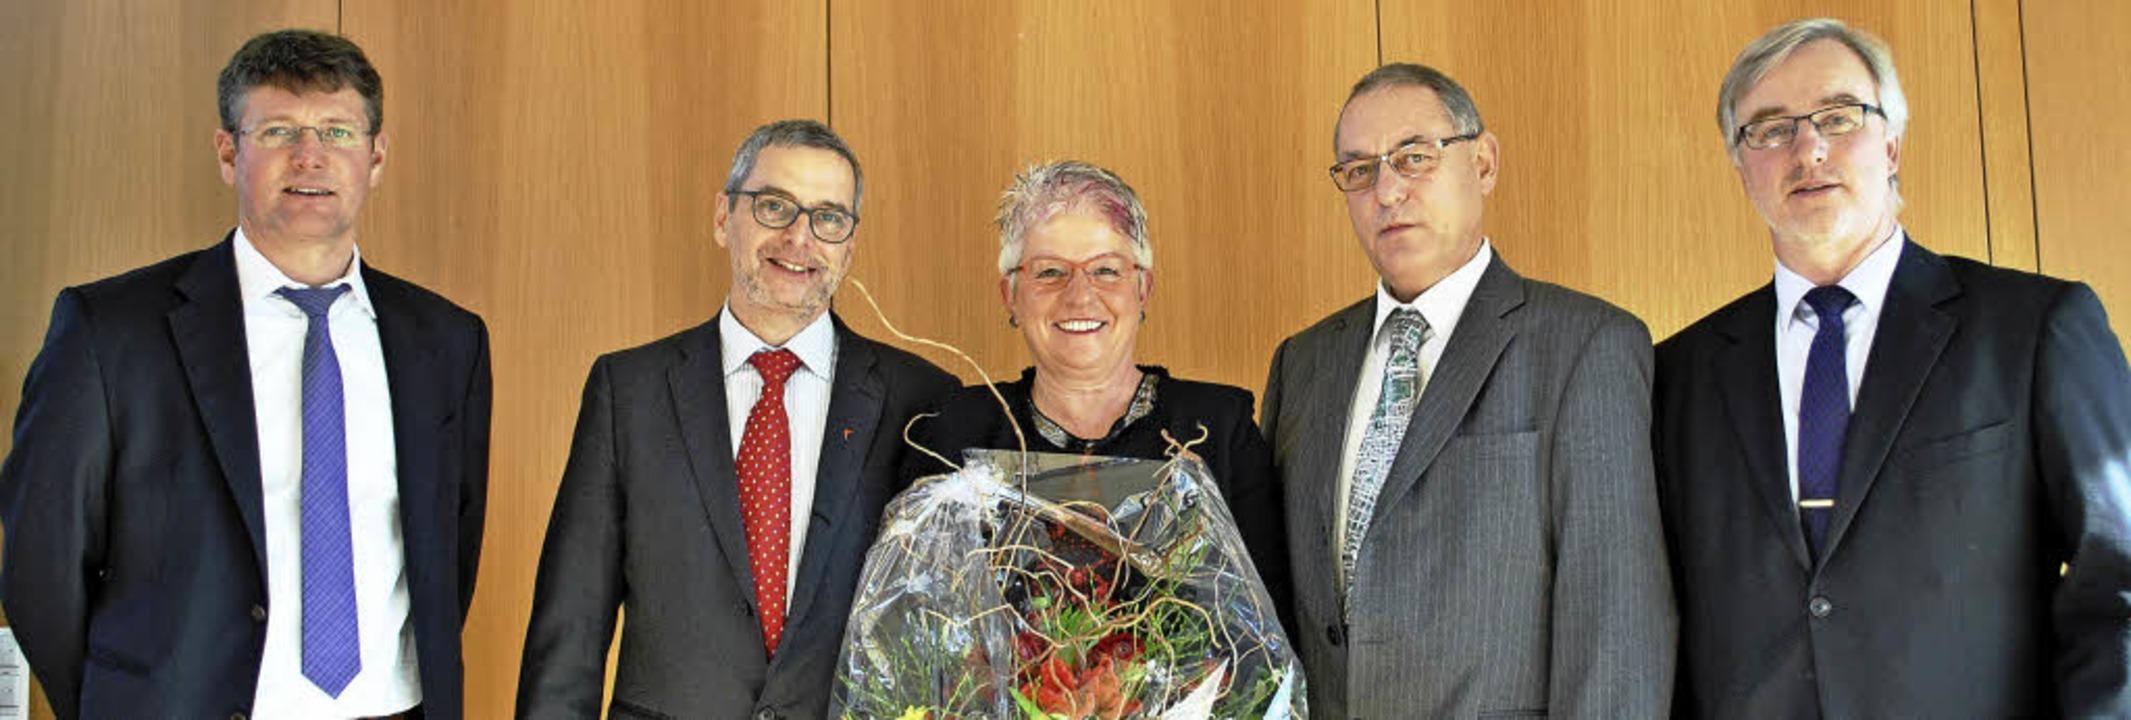 Lauter Lobreden (von links): Oliver Ma...eier, Rudolf Kothmeier, Erwin Drixler   | Foto: rob